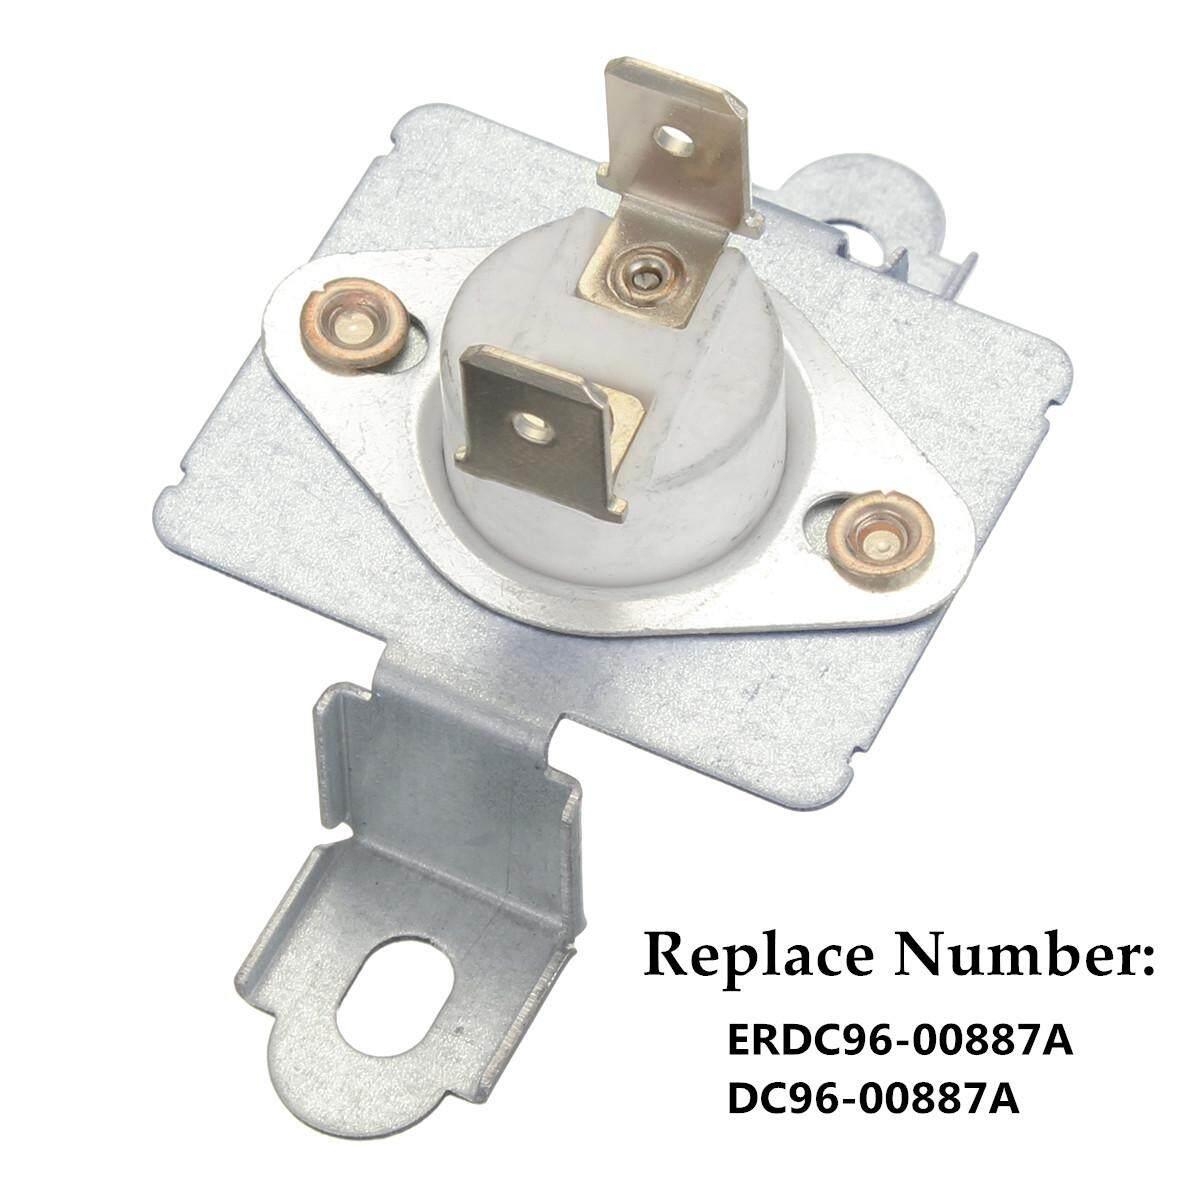 Aftermarket Baru ERDC96-00887A, DC96-00887A Pengering Thermostat